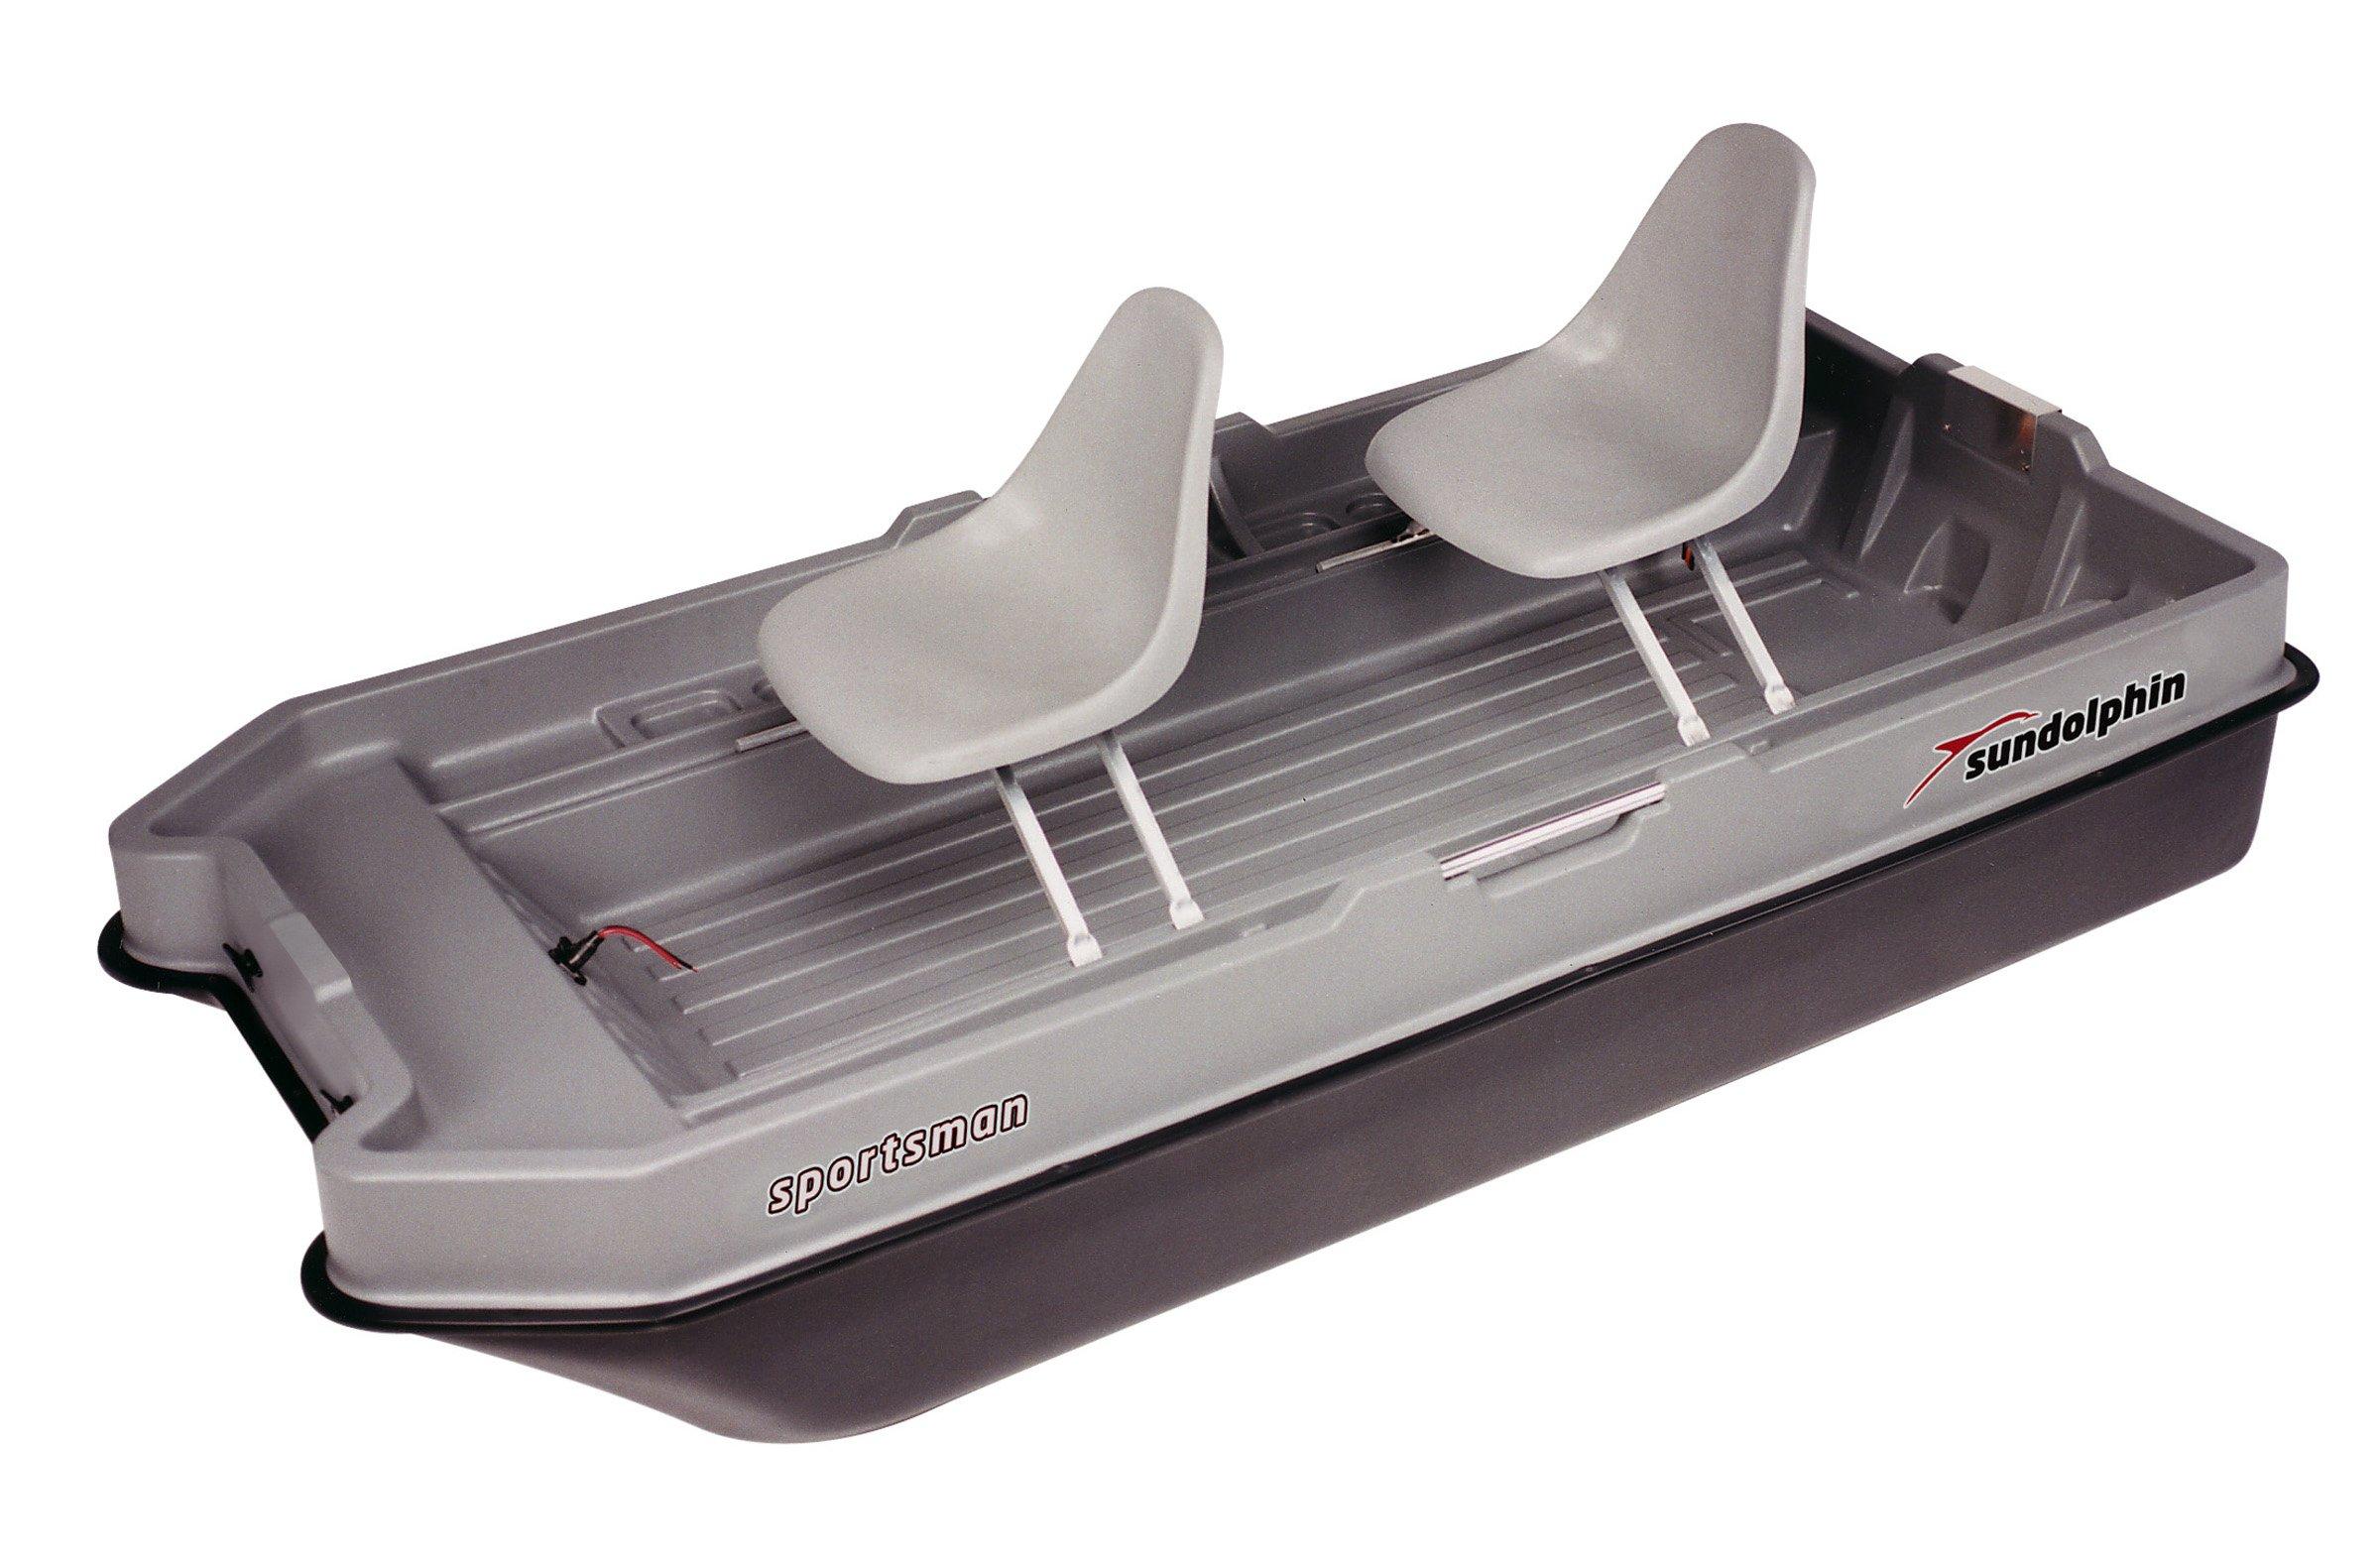 Sun Dolphin Sportsman Fishing Boat (Gray/Black, 8.6-Feet) by SUNDOLPHIN